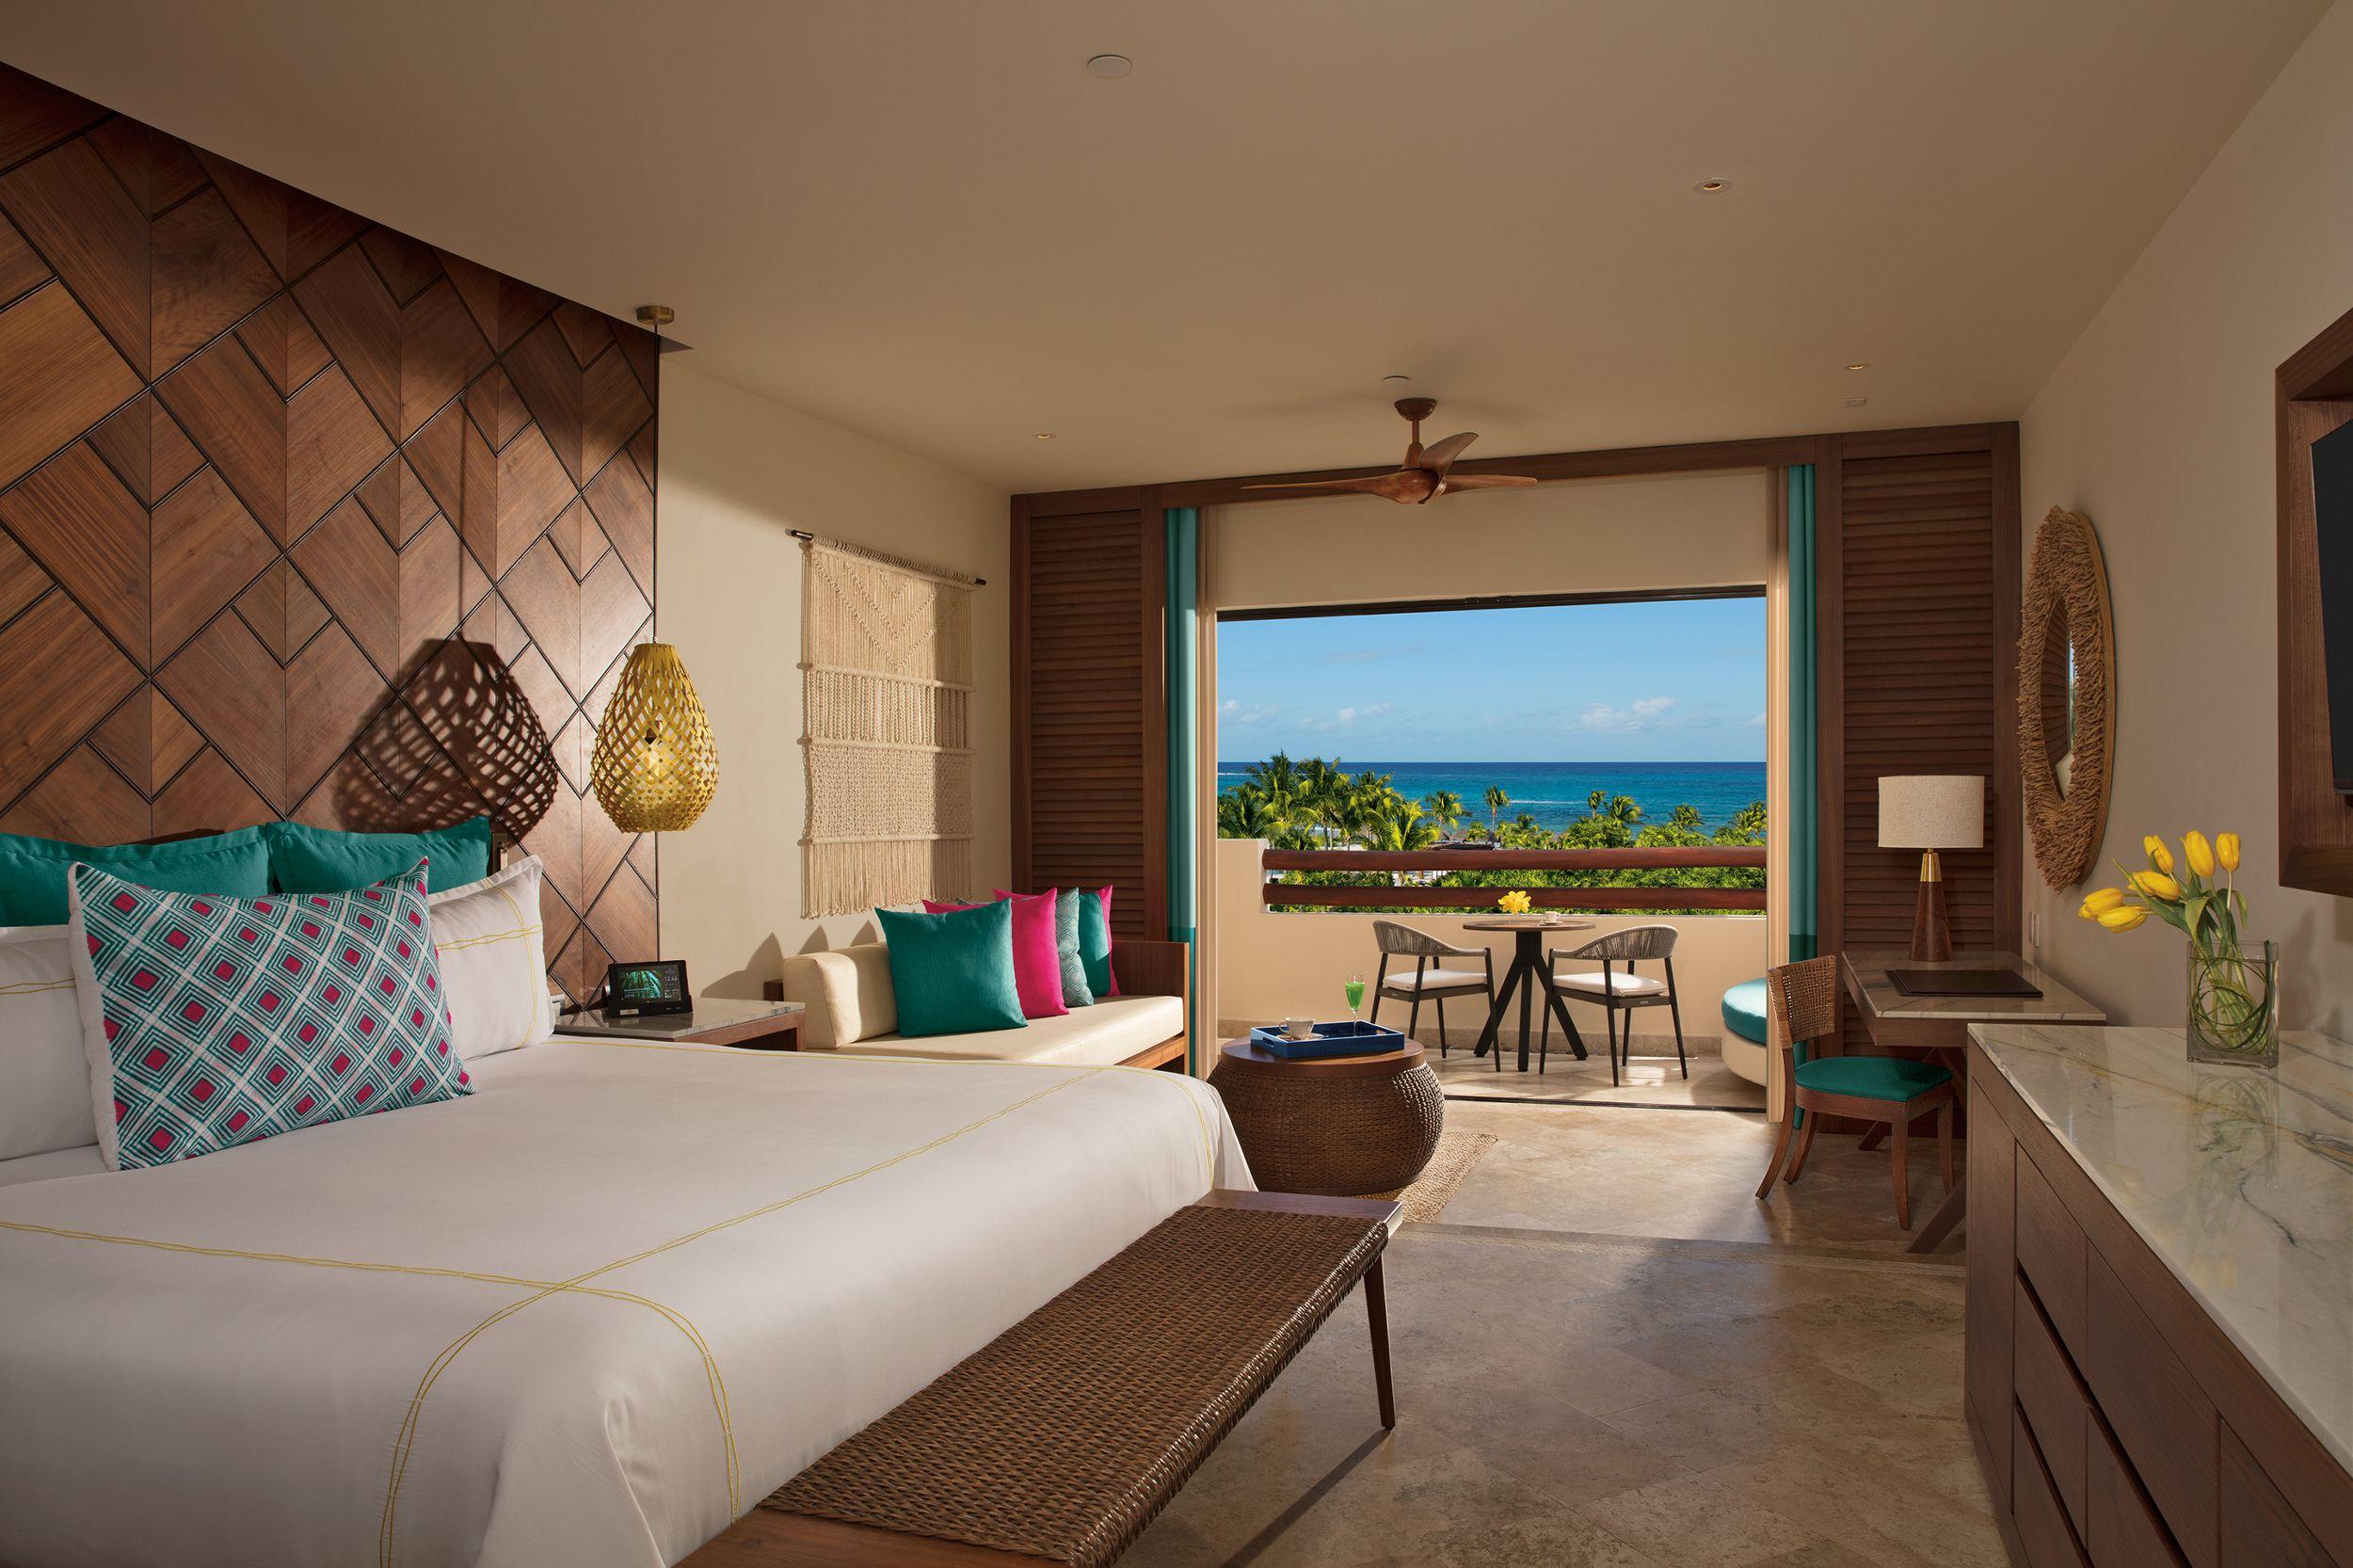 luxury resort suite